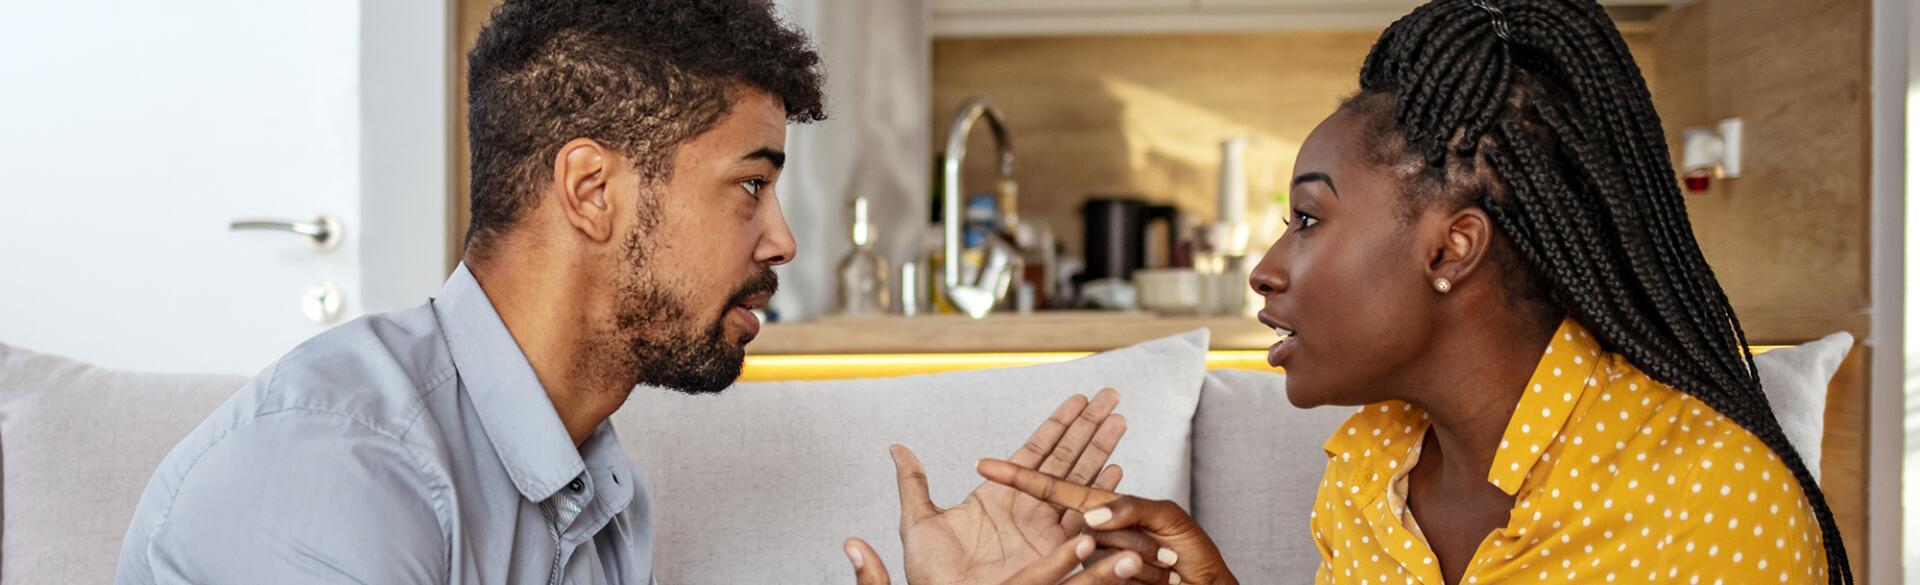 Black woman and man quarreling at home